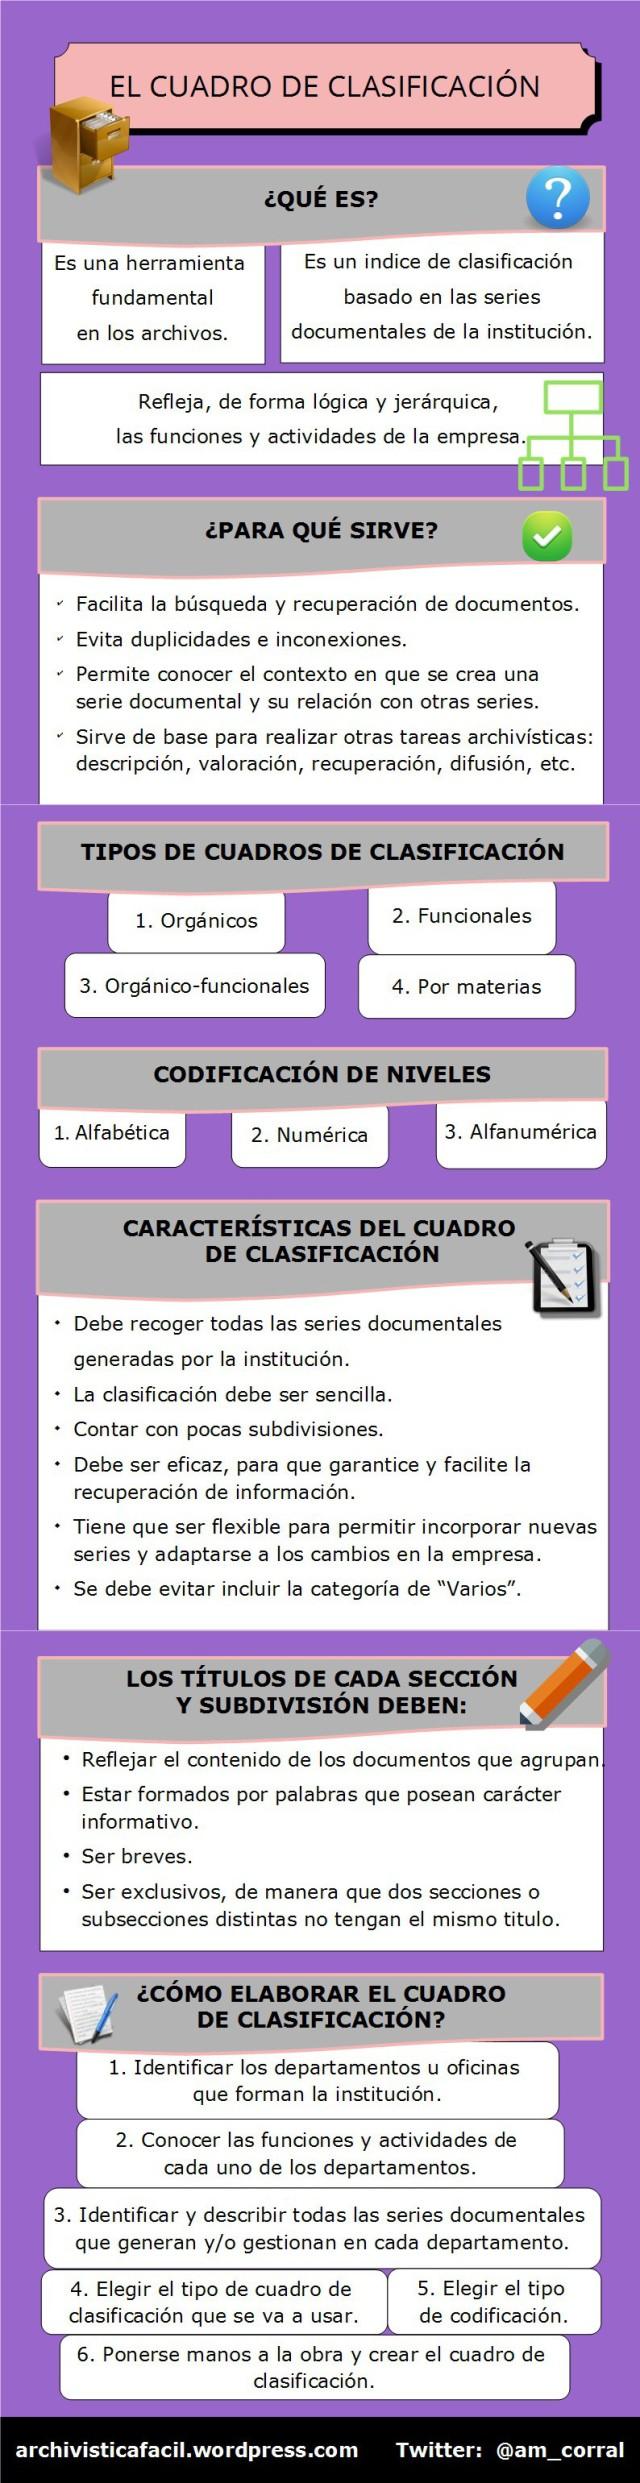 Infografia: Cuadro de clasificación para archivos